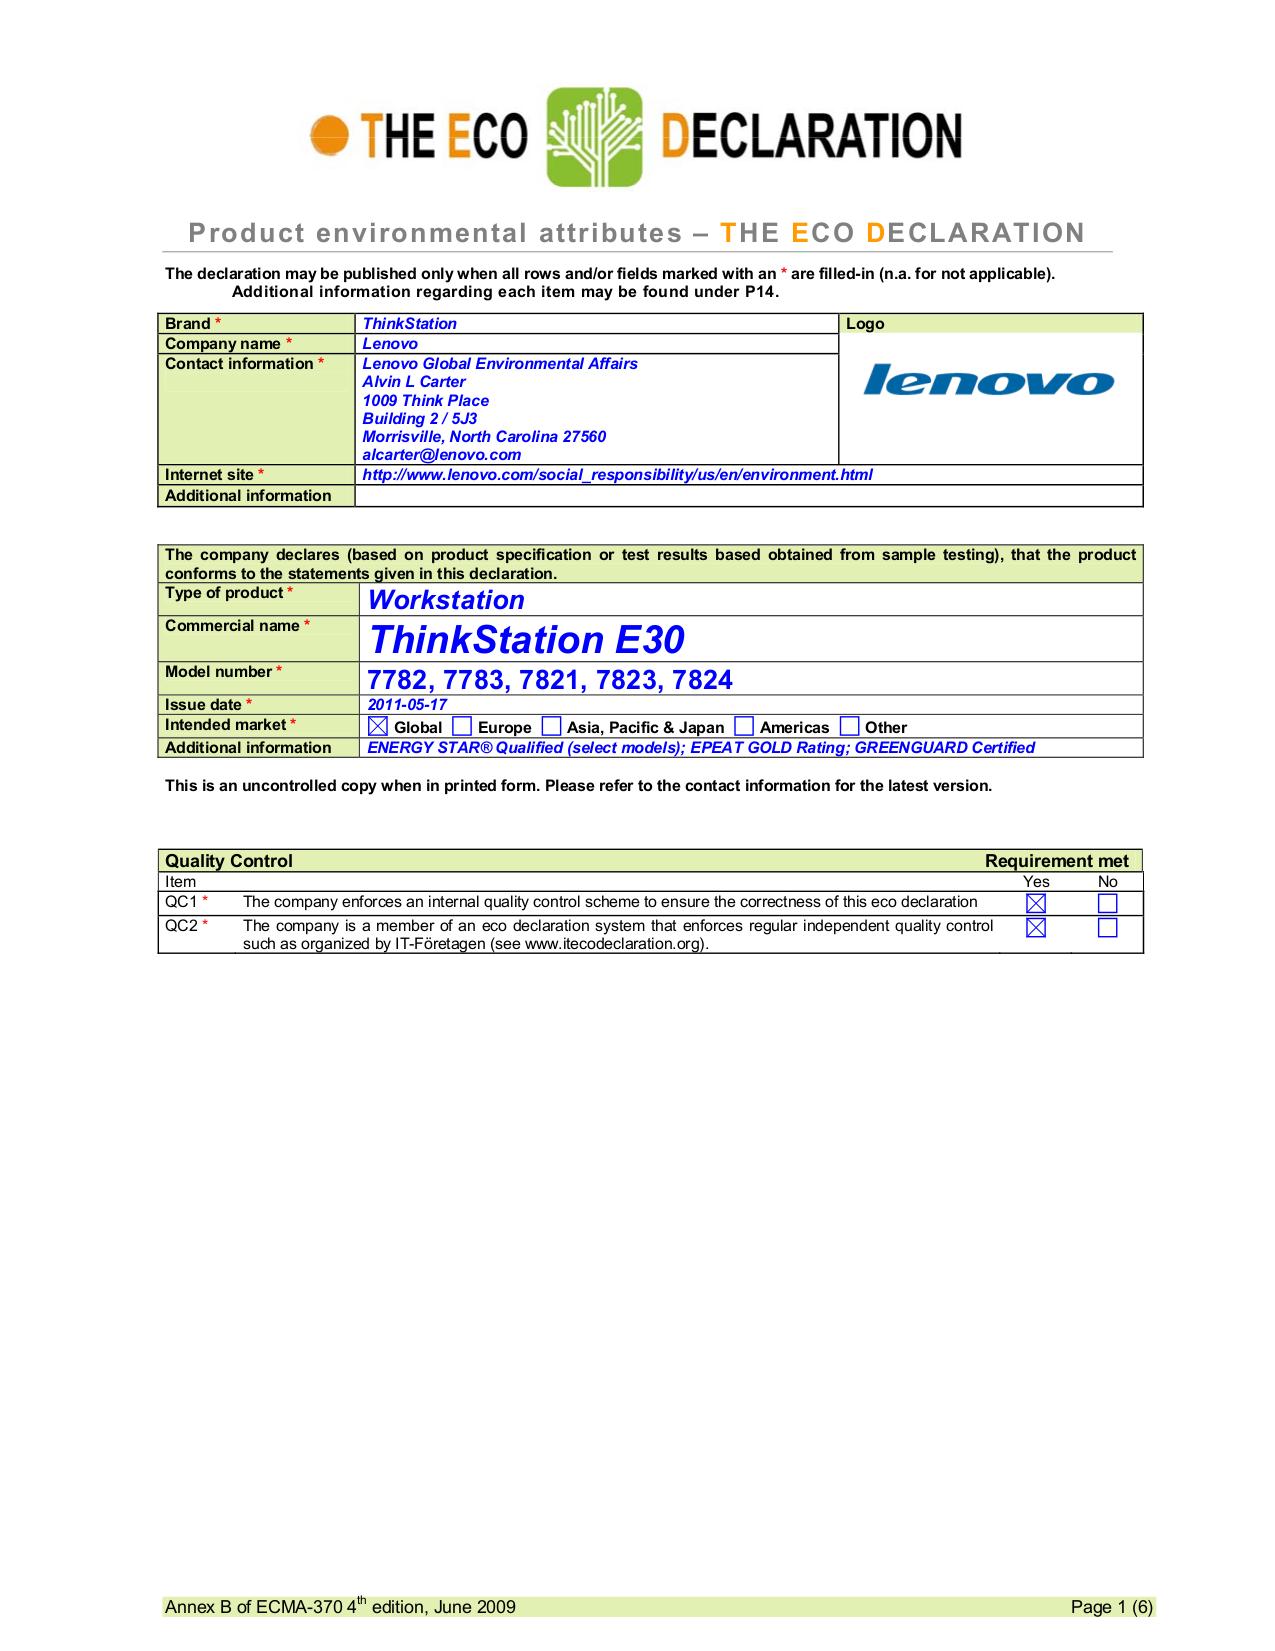 pdf for Lenovo Desktop ThinkStation E30 7824 manual